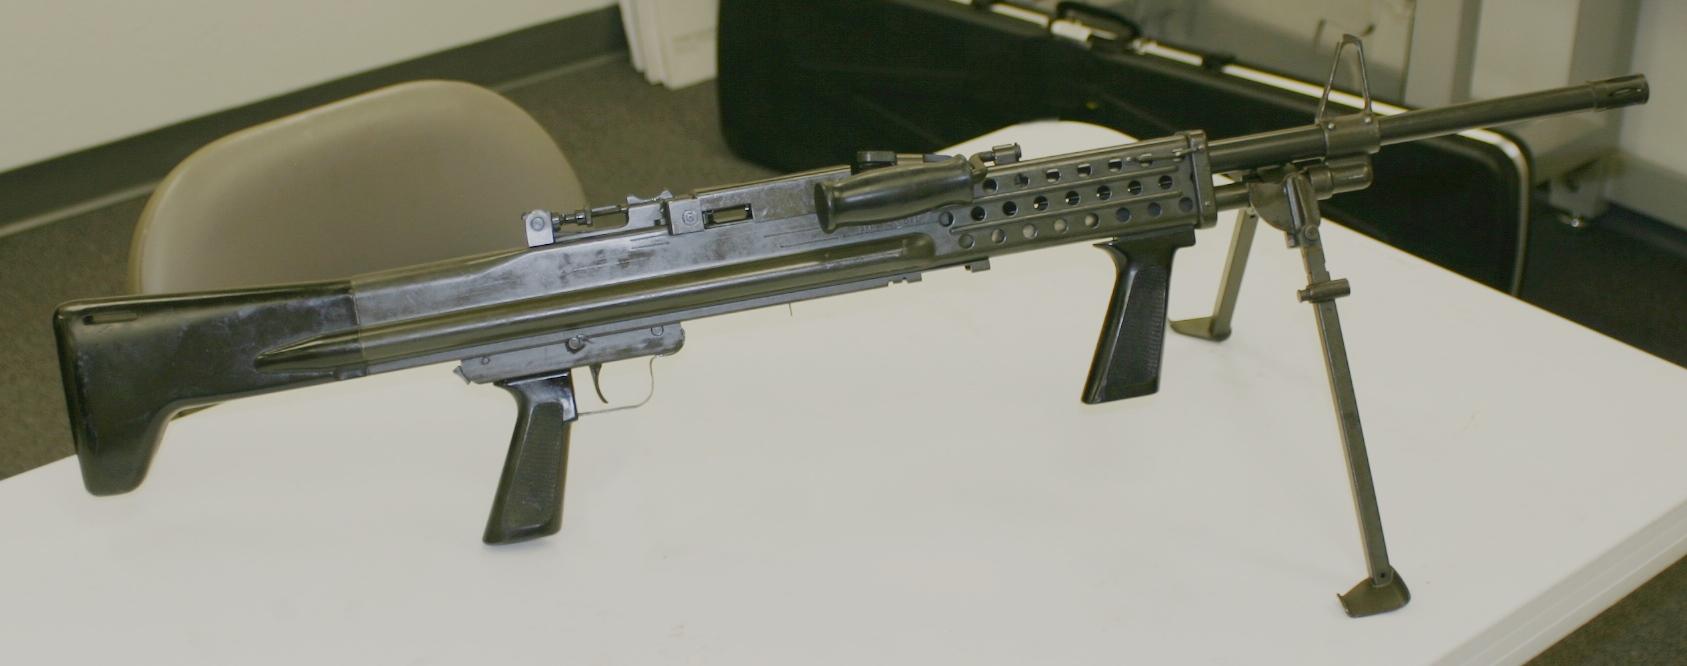 Colt CMG-2 Light Machine Gun Video and Manual – Forgotten Weapons